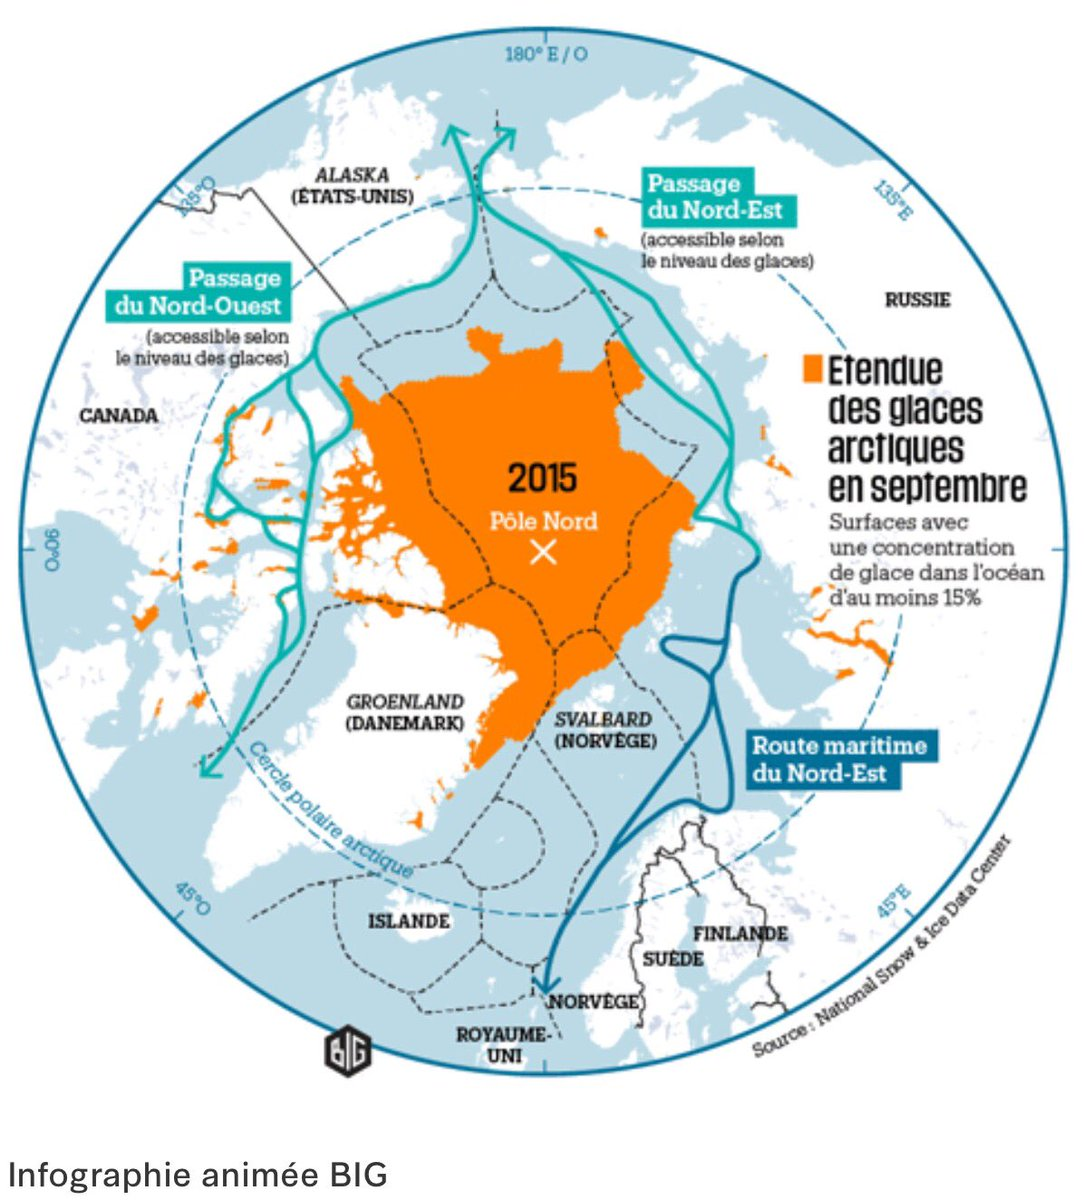 #Climat: ainsi fond, fond, fondl'#Arctique  http://www. liberation.fr/plante/2017/01 /09/climat-ainsi-fond-fond-fond-l-arctique_1540220 &nbsp; …  via @libe<br>http://pic.twitter.com/Ofkj2CxNpQ